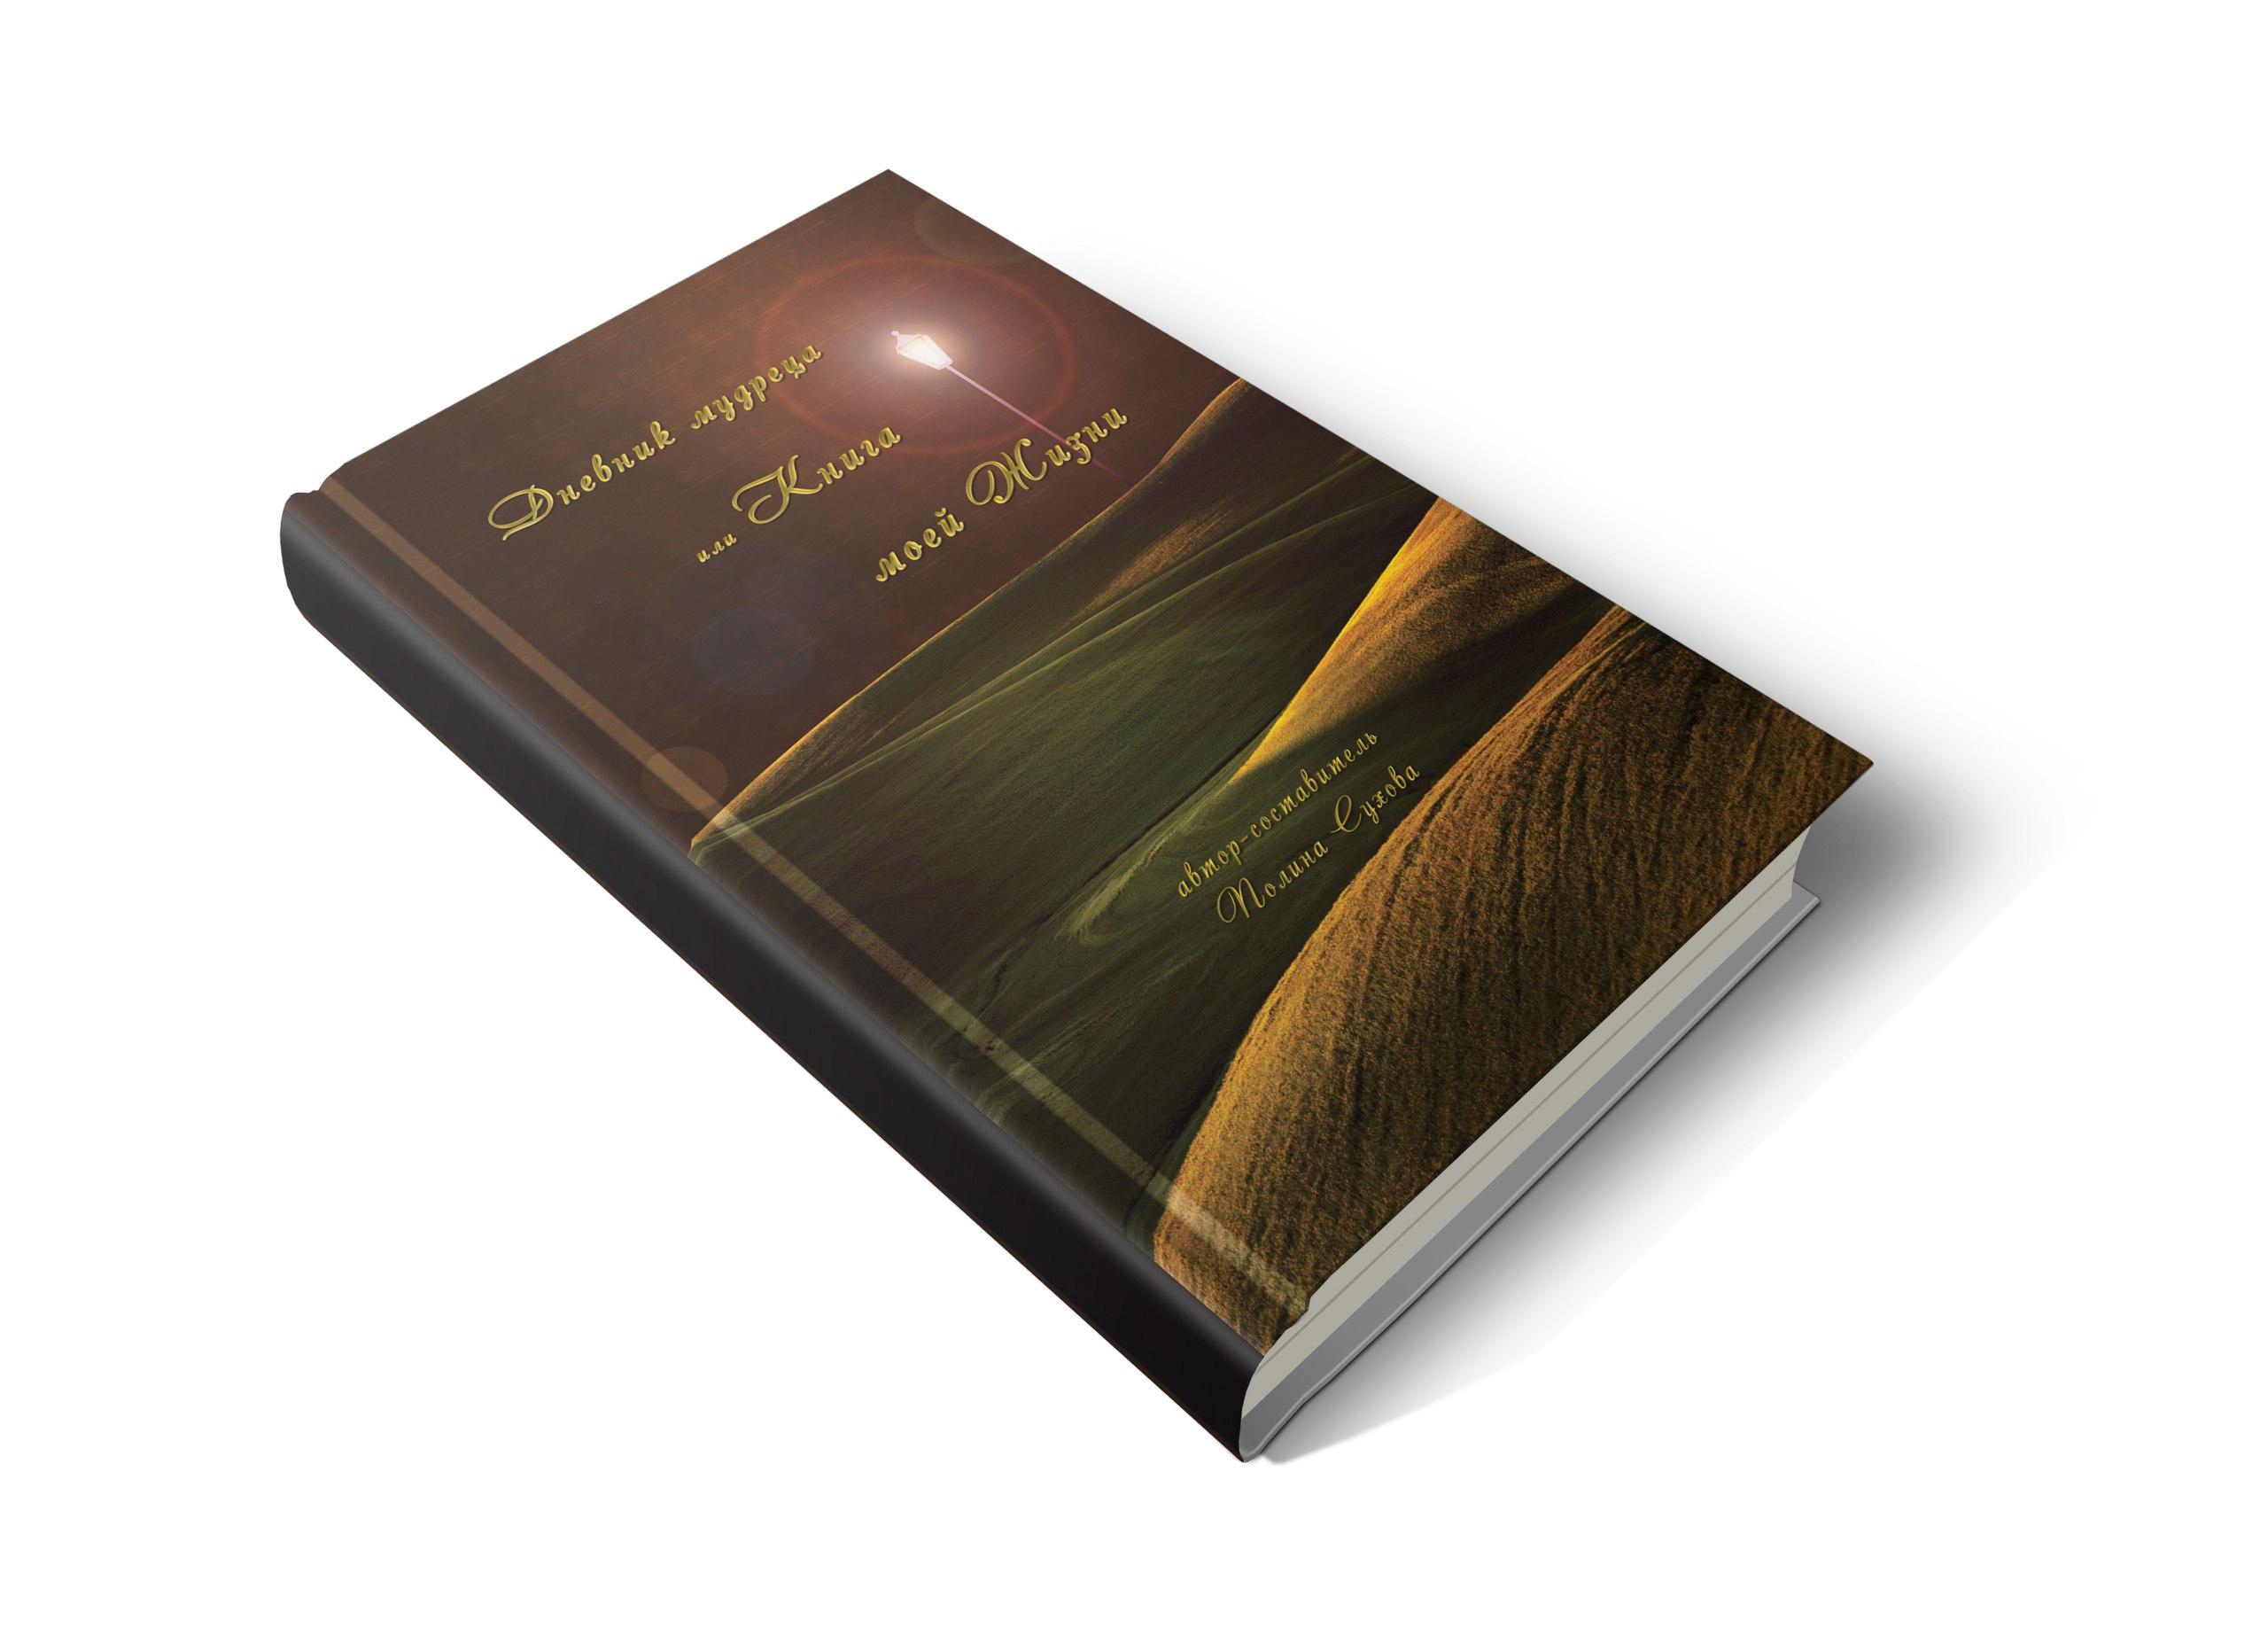 Дневник мудреца, Полина Сухова, книга жизни